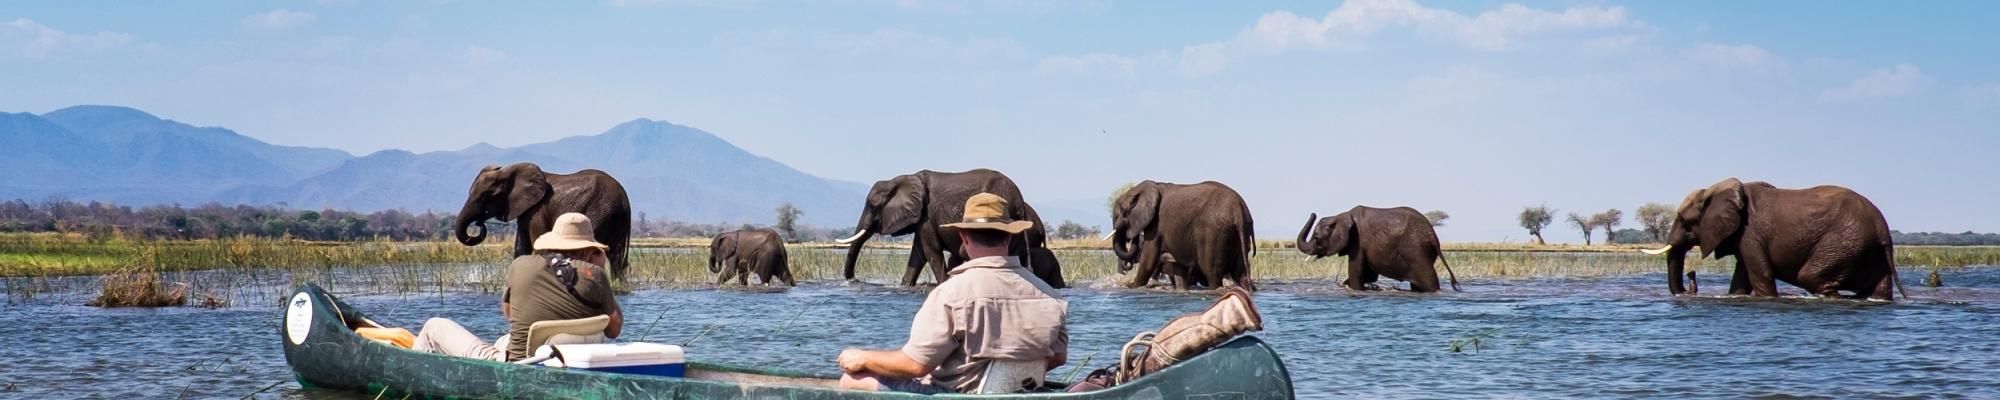 Safari famille Zimbabwe